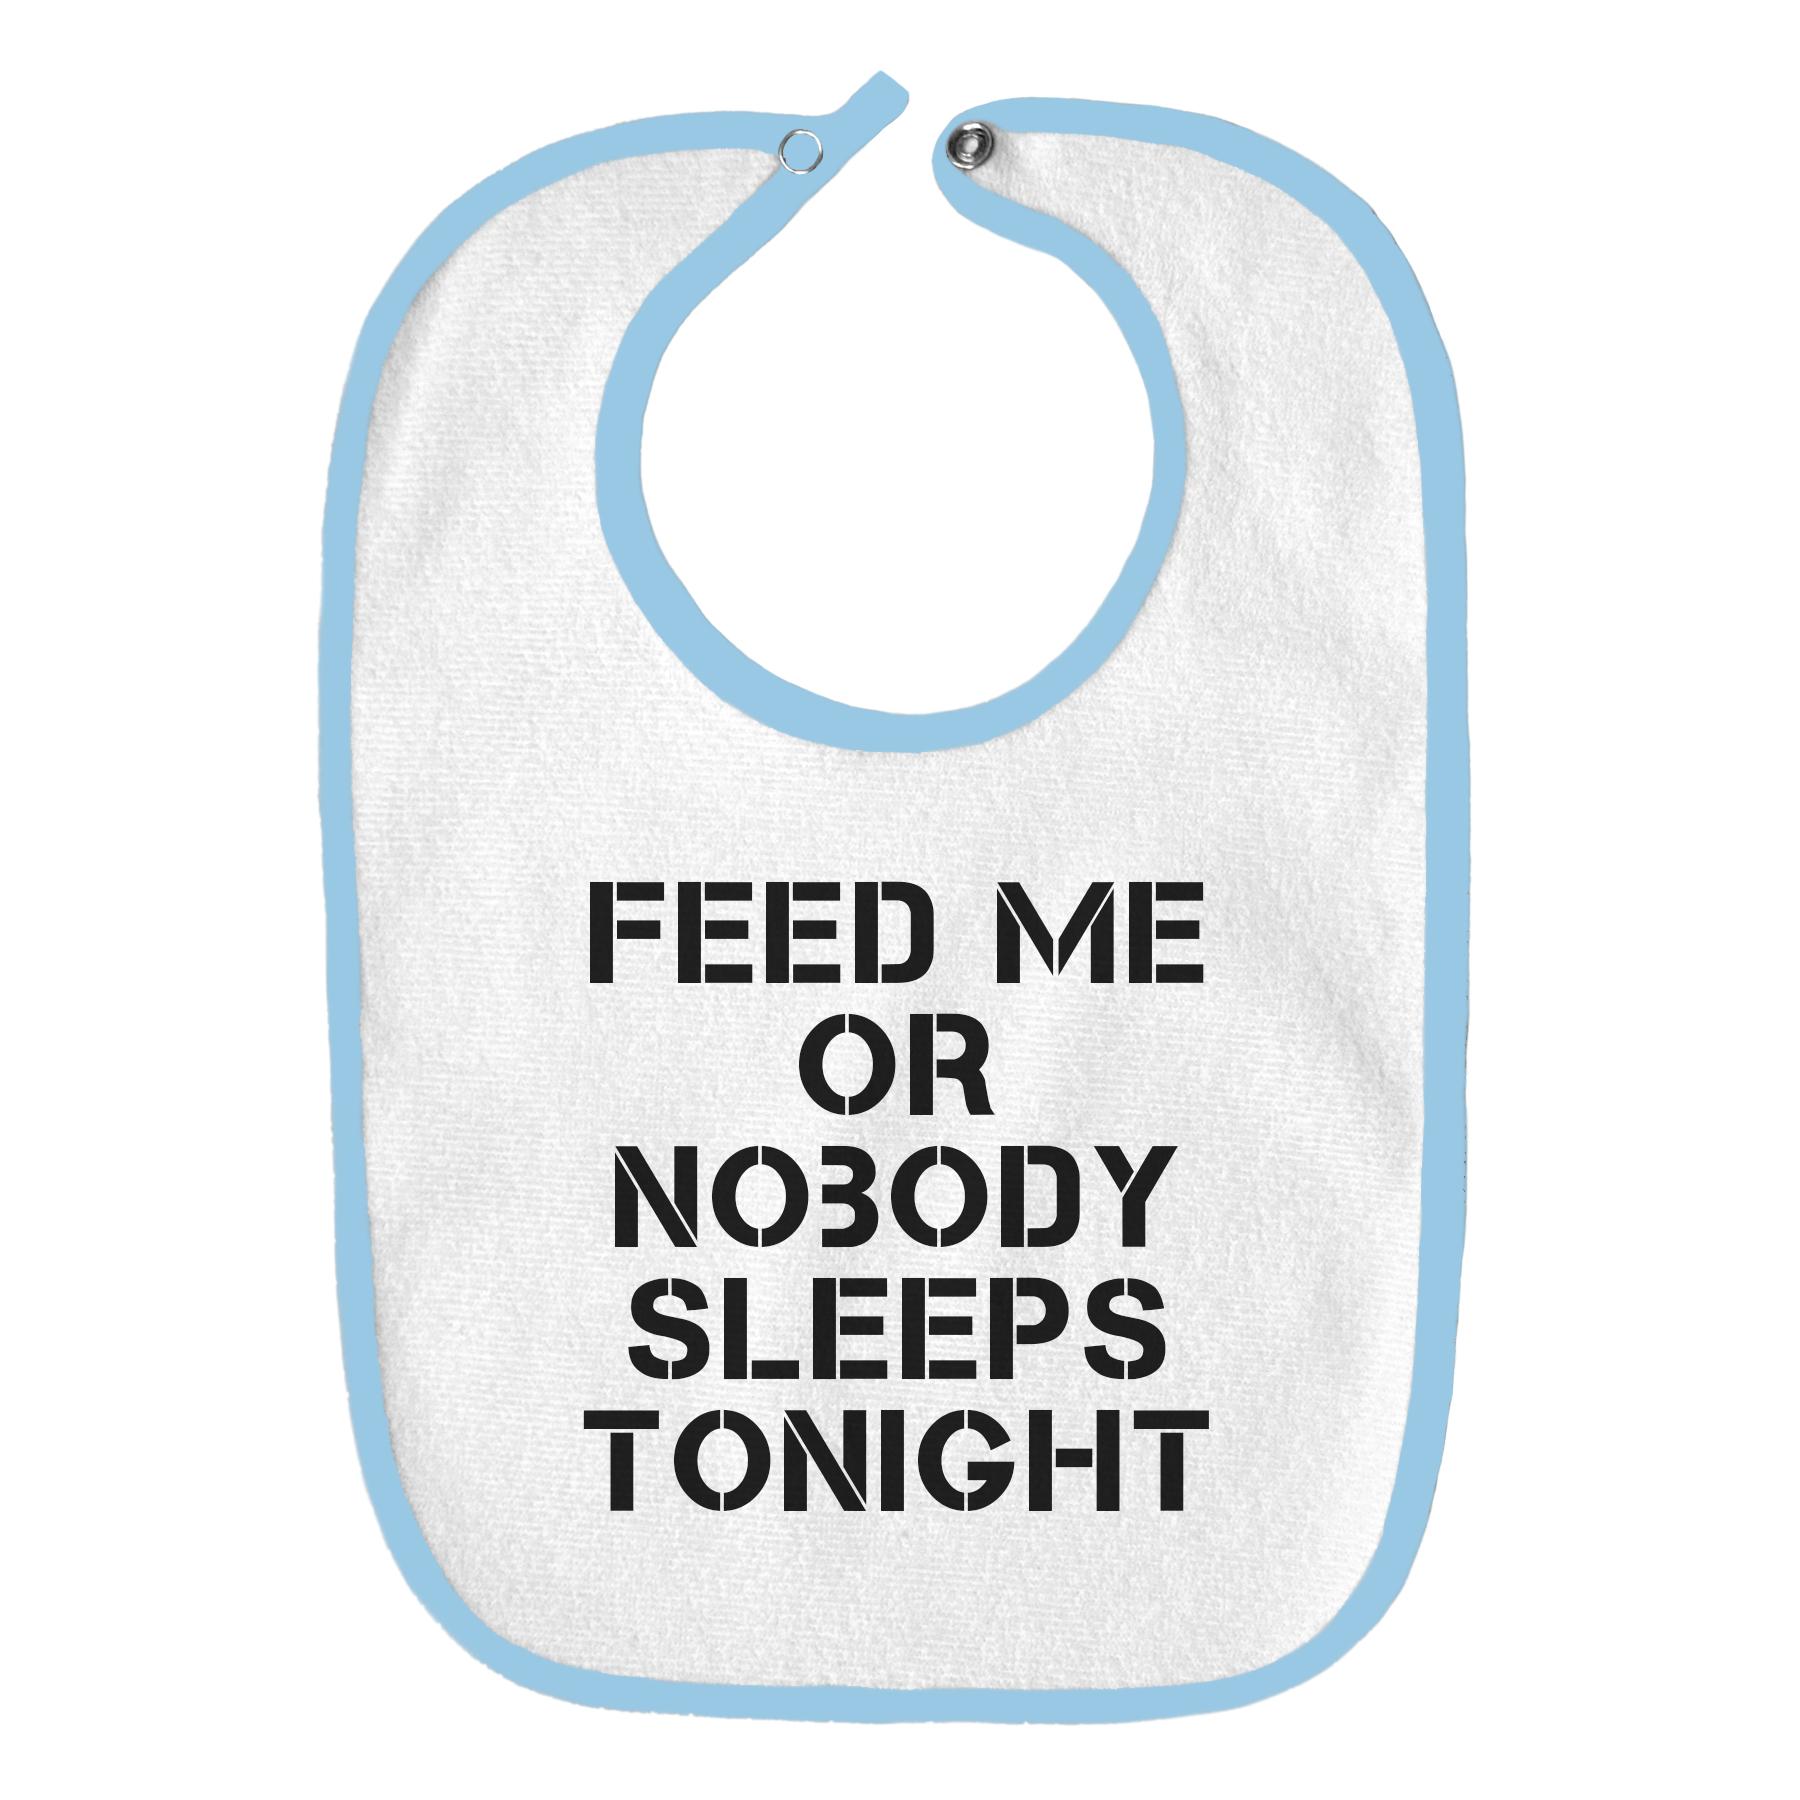 Feed Me or Nobody Sleeps Tonight Funny Parody Infant Baby Bib